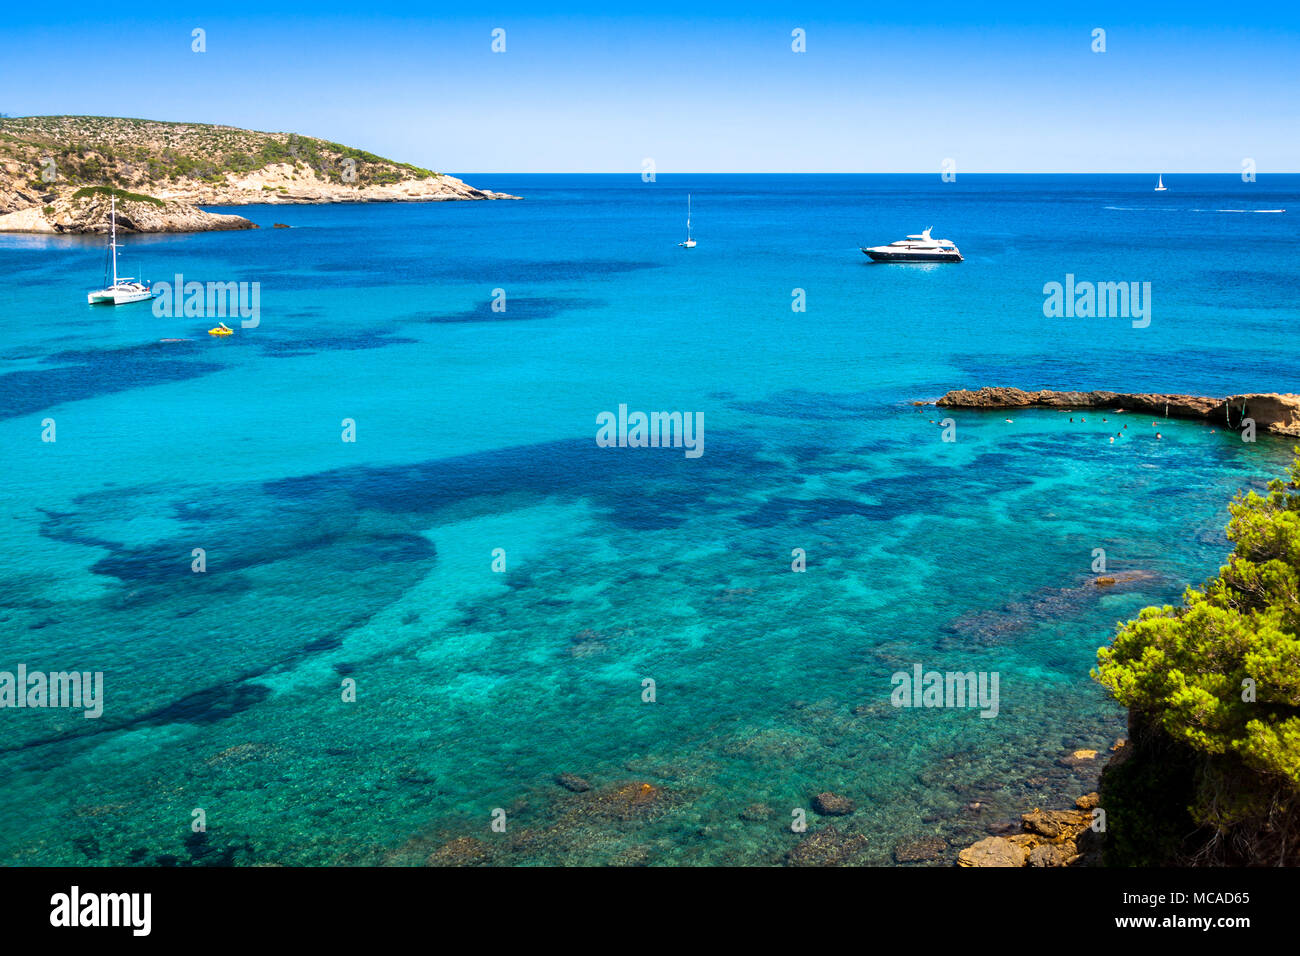 San Miguel - Ibiza - Balearic Islands - Spain - Stock Image